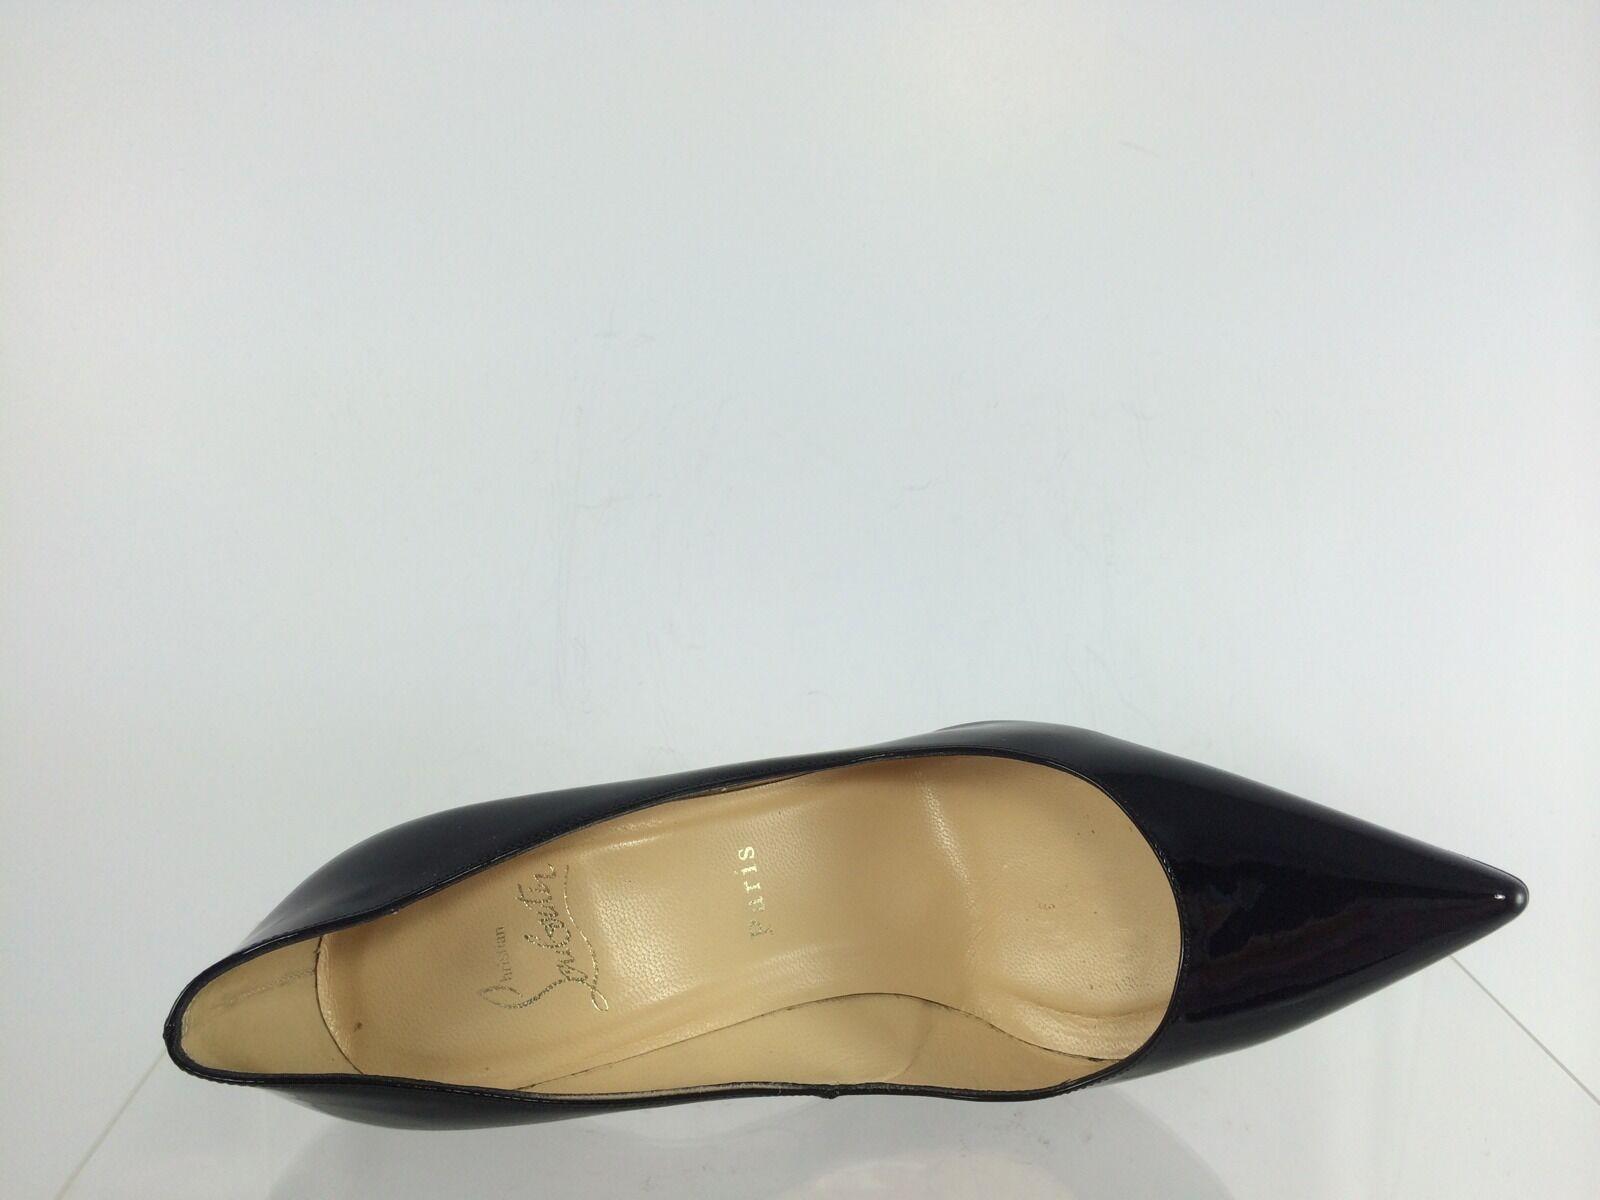 Christian Louboutin Womens Decollete 554 100 Patent Patent Patent Leather Black  shoes 38.5 24e028